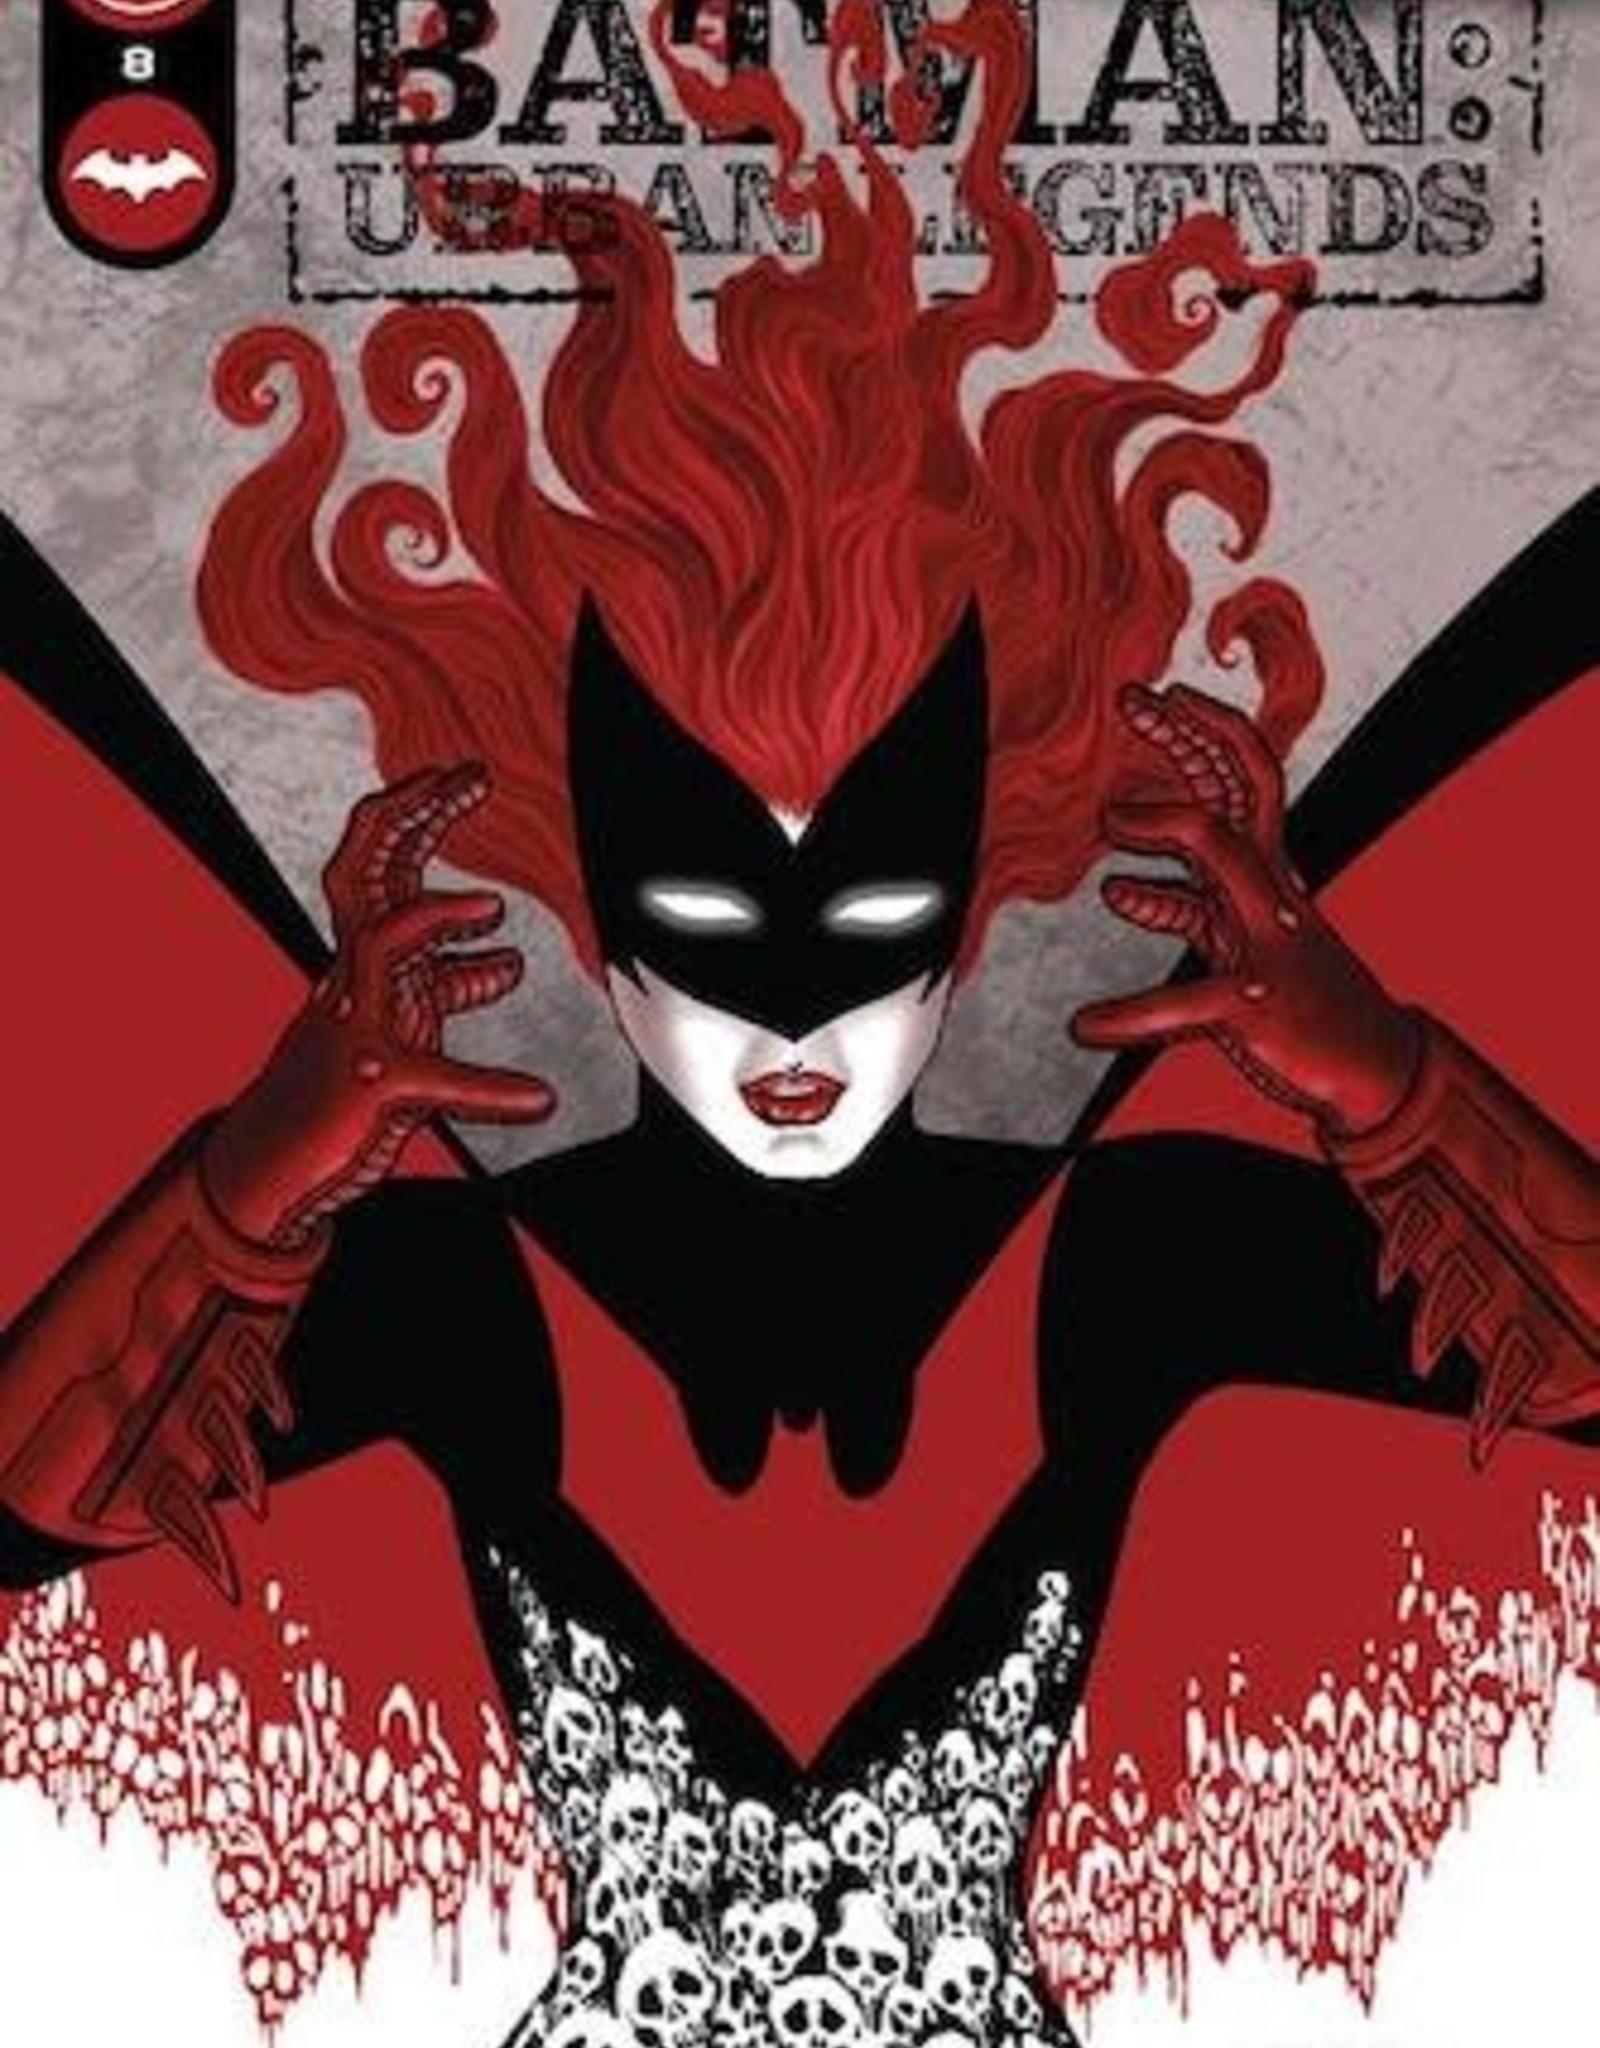 DC Comics Batman Urban Legends #8 Cvr A Colleen Doran (Fear State)